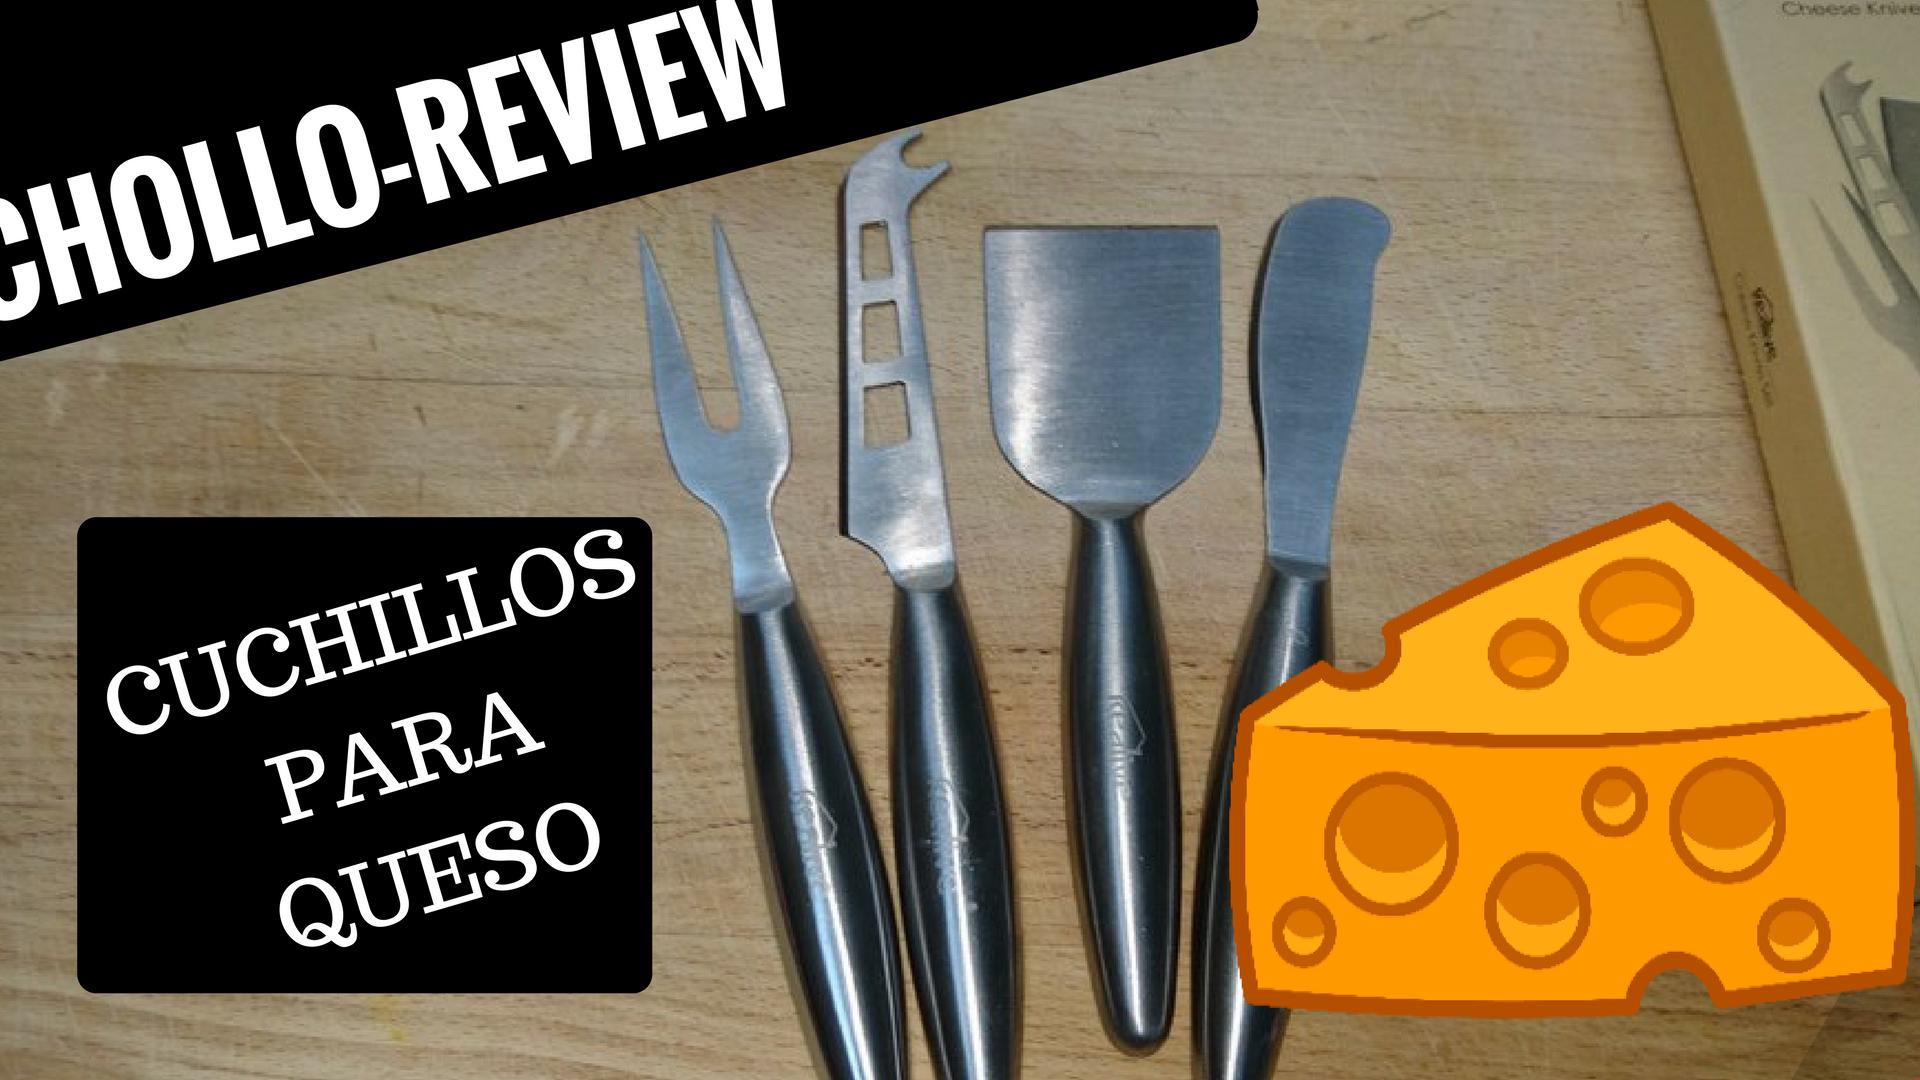 Super kit de cuchillos para cortar queso – Chollo review!